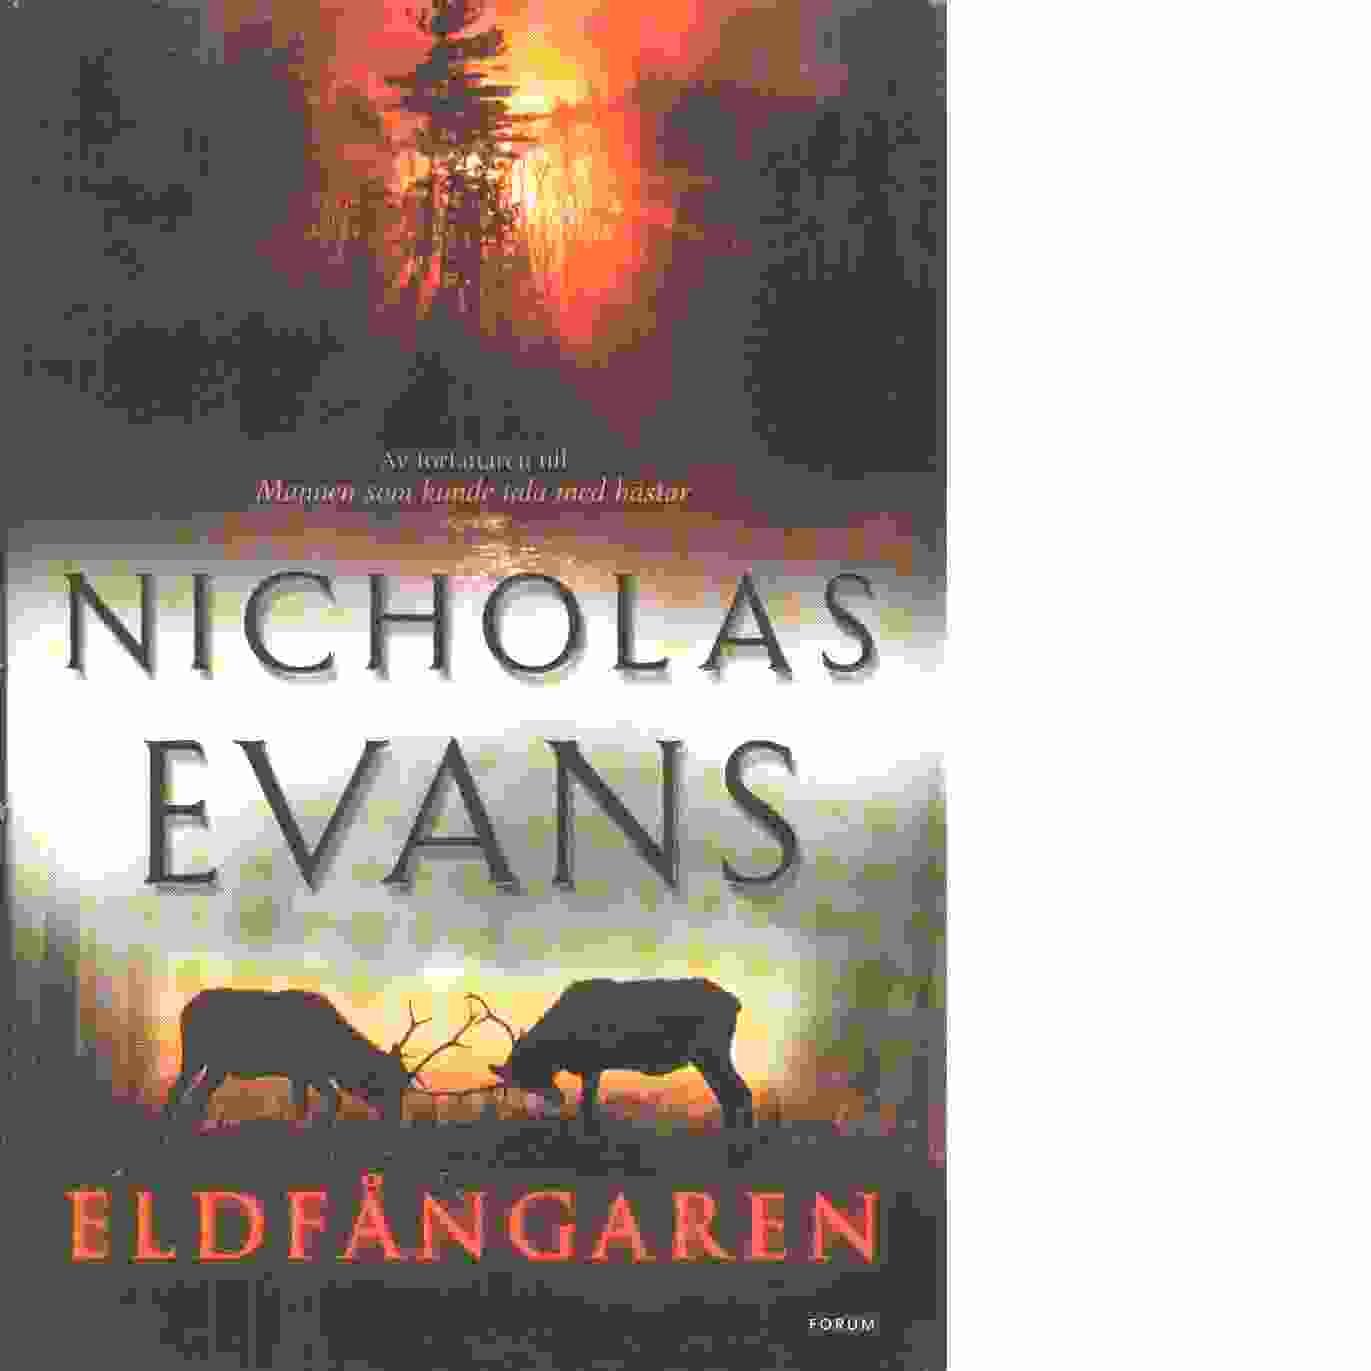 Eldfångaren  - Evans, Nicholas